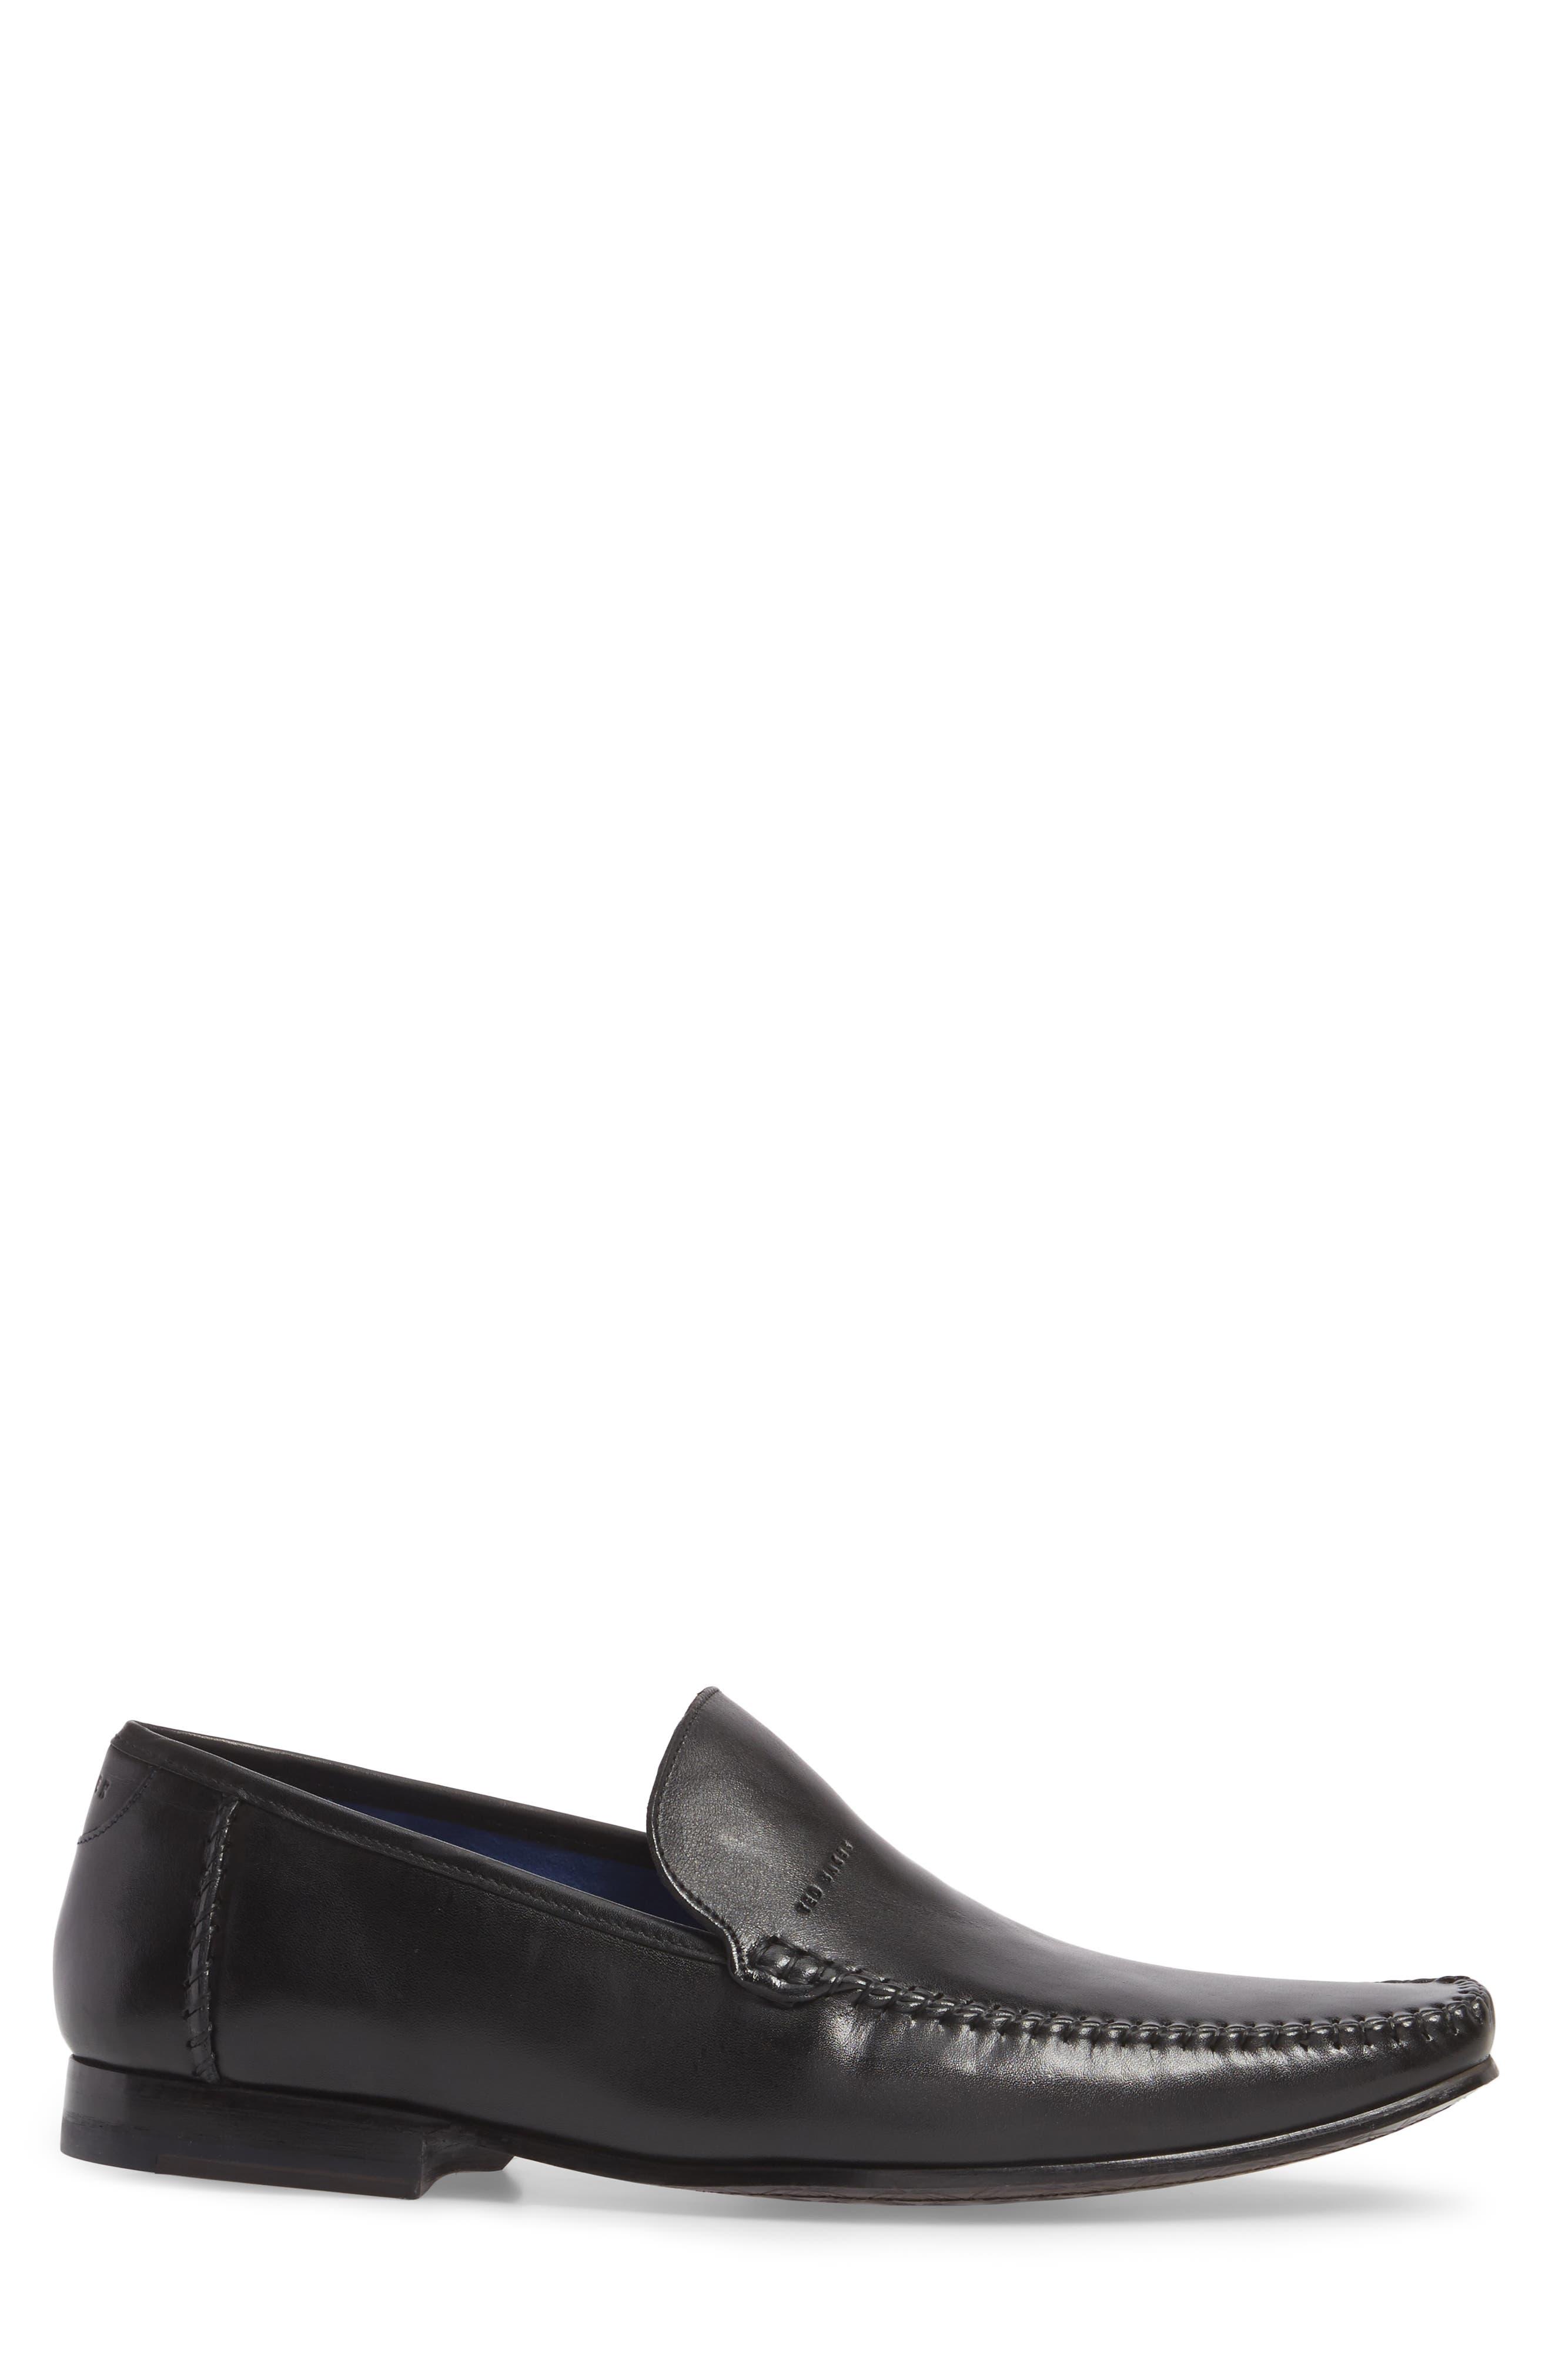 Bly 9 Venetian Loafer,                             Alternate thumbnail 3, color,                             Black Leather